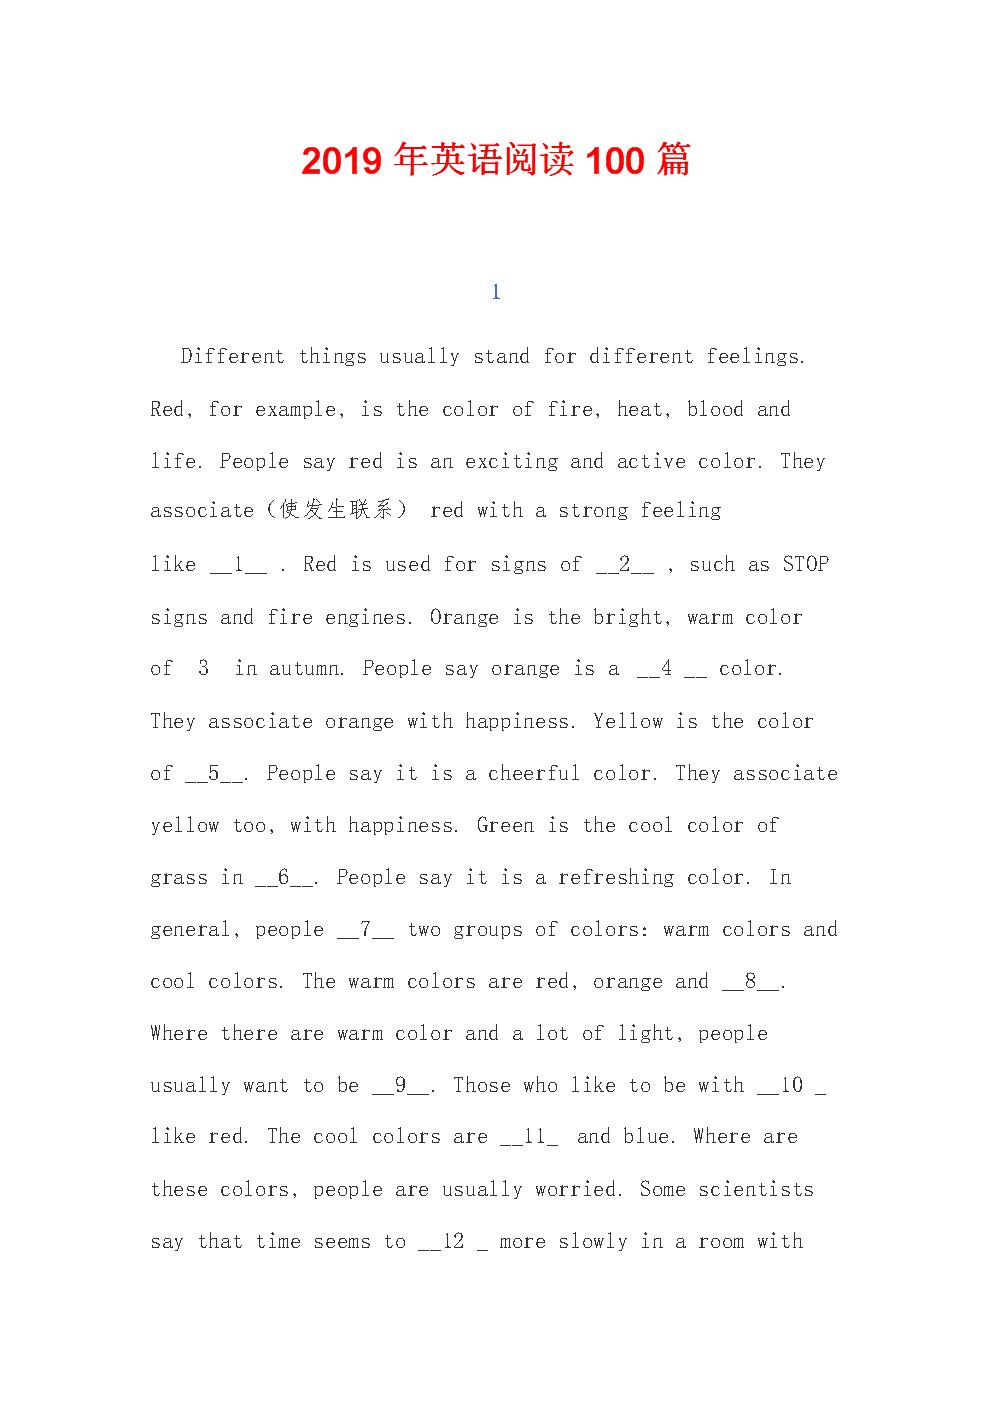 2019年英语阅读100篇.doc